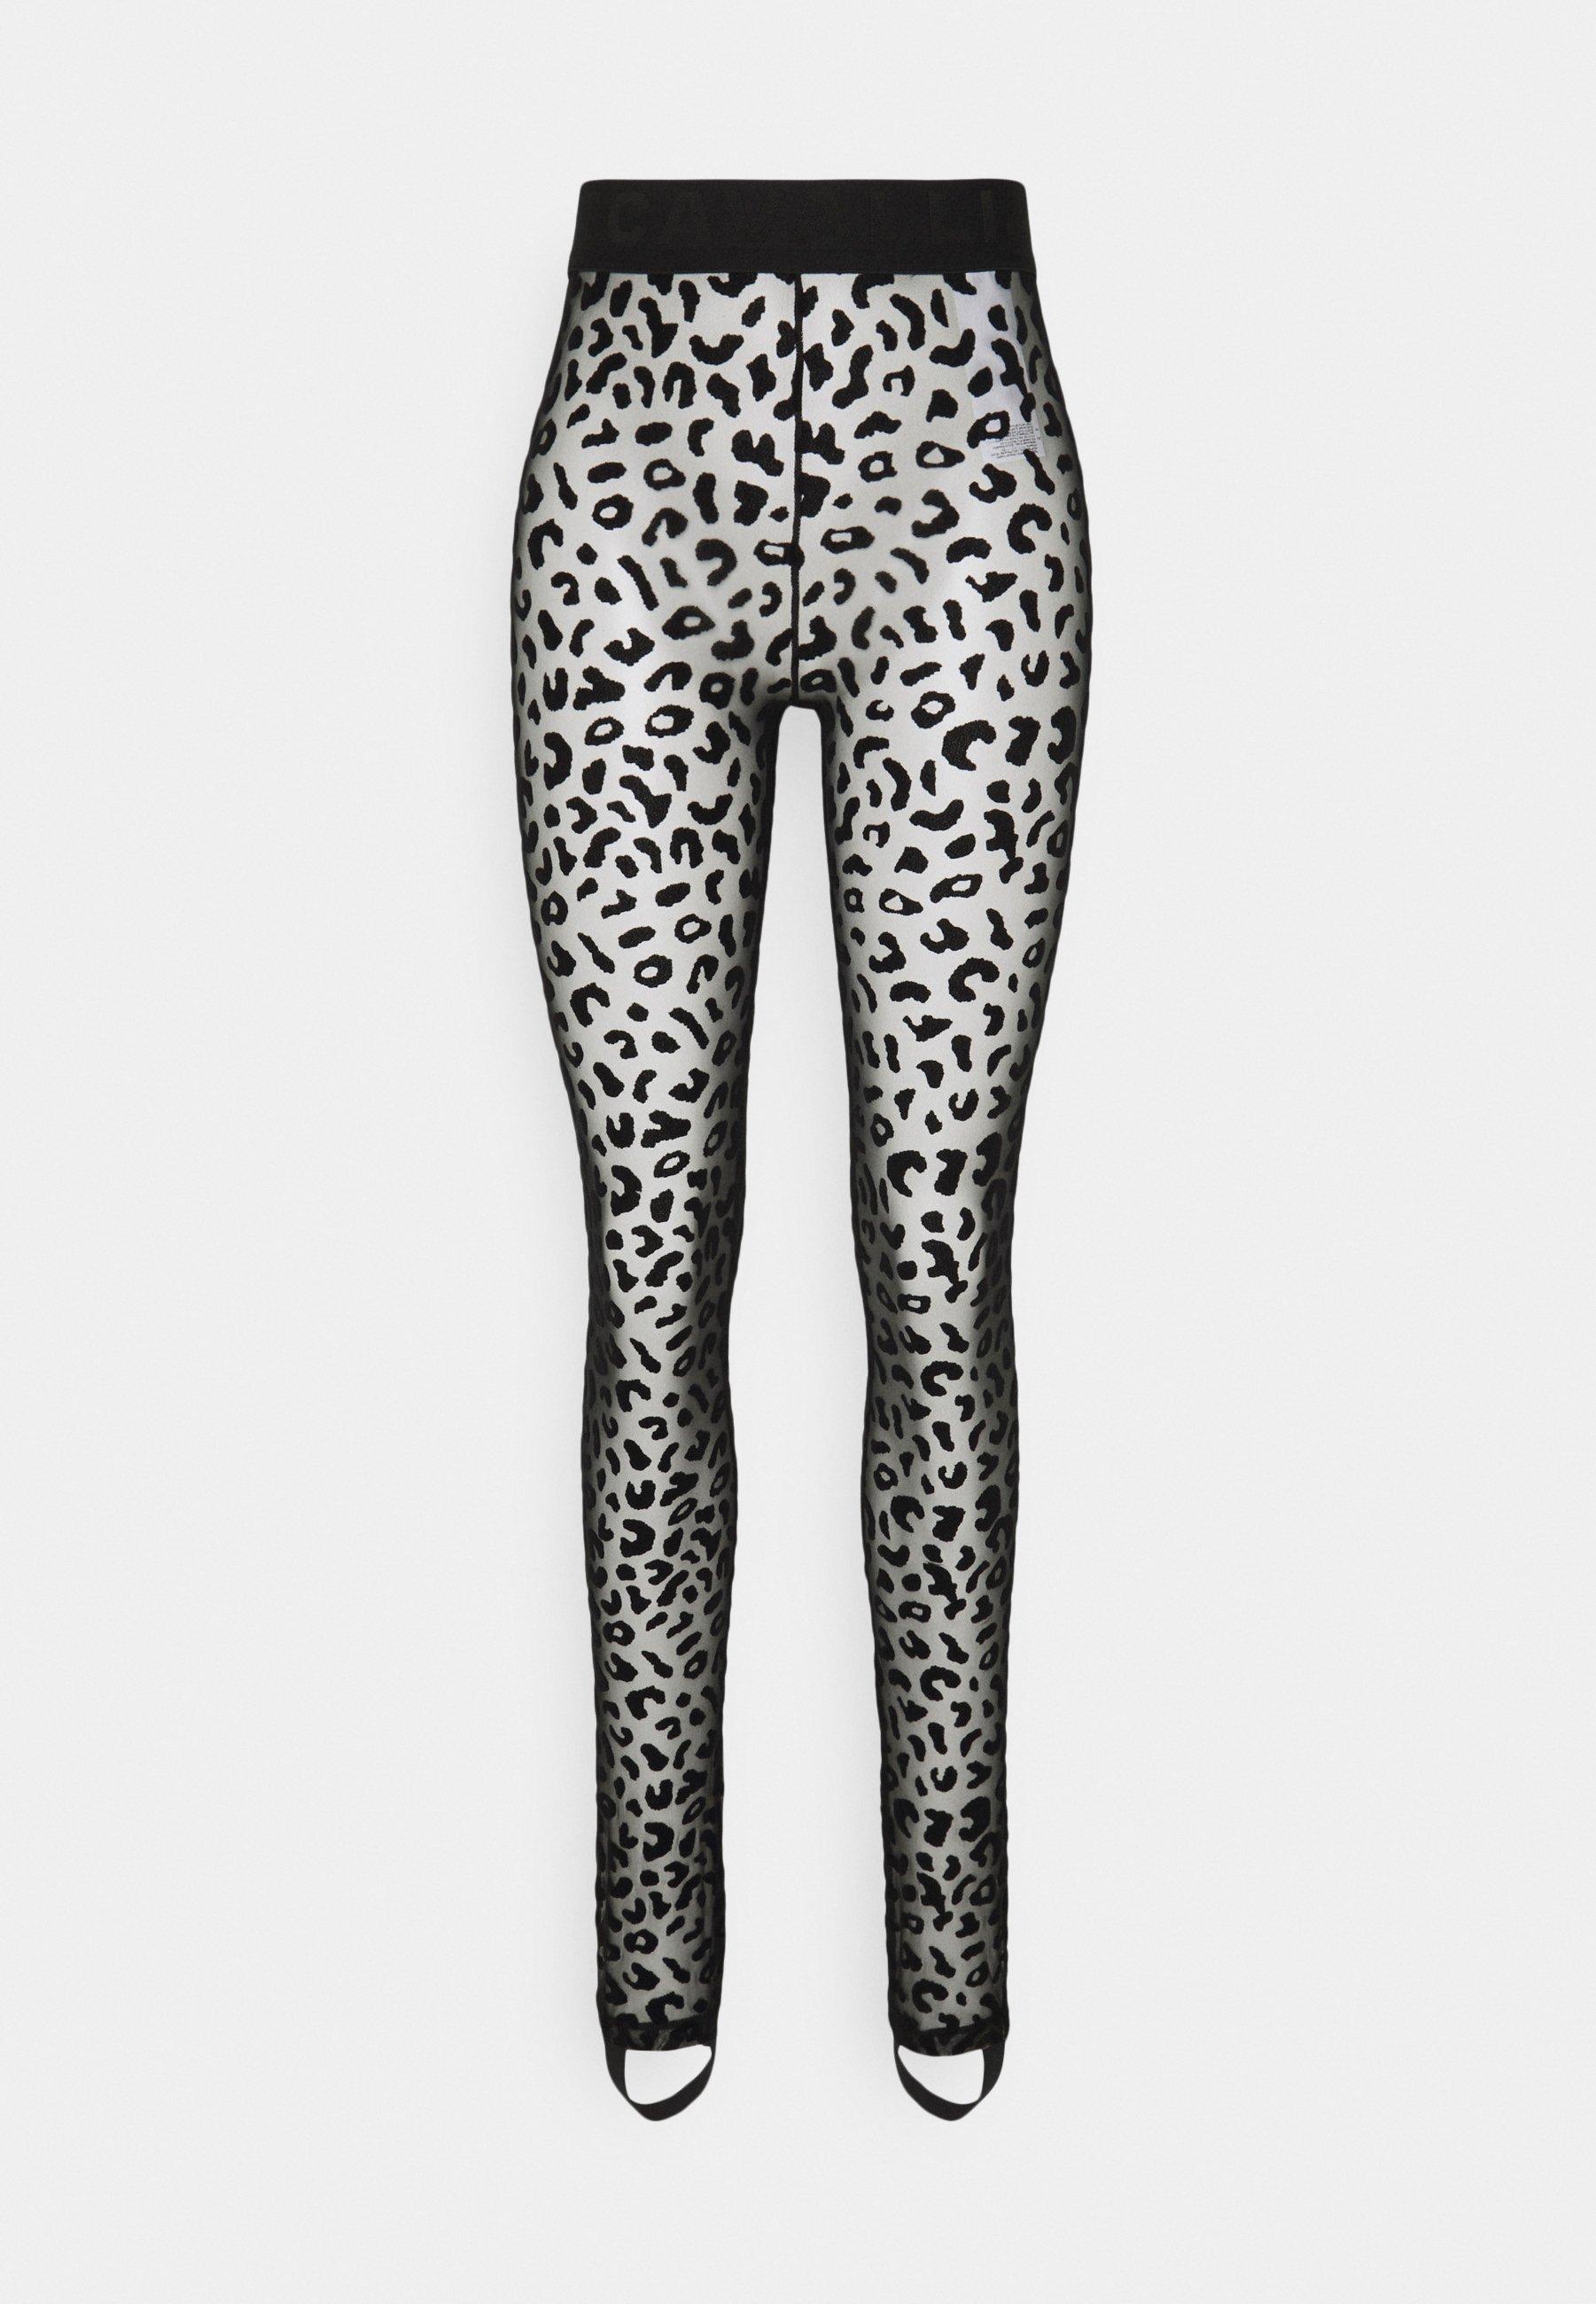 Women PANTS - Leggings - Trousers